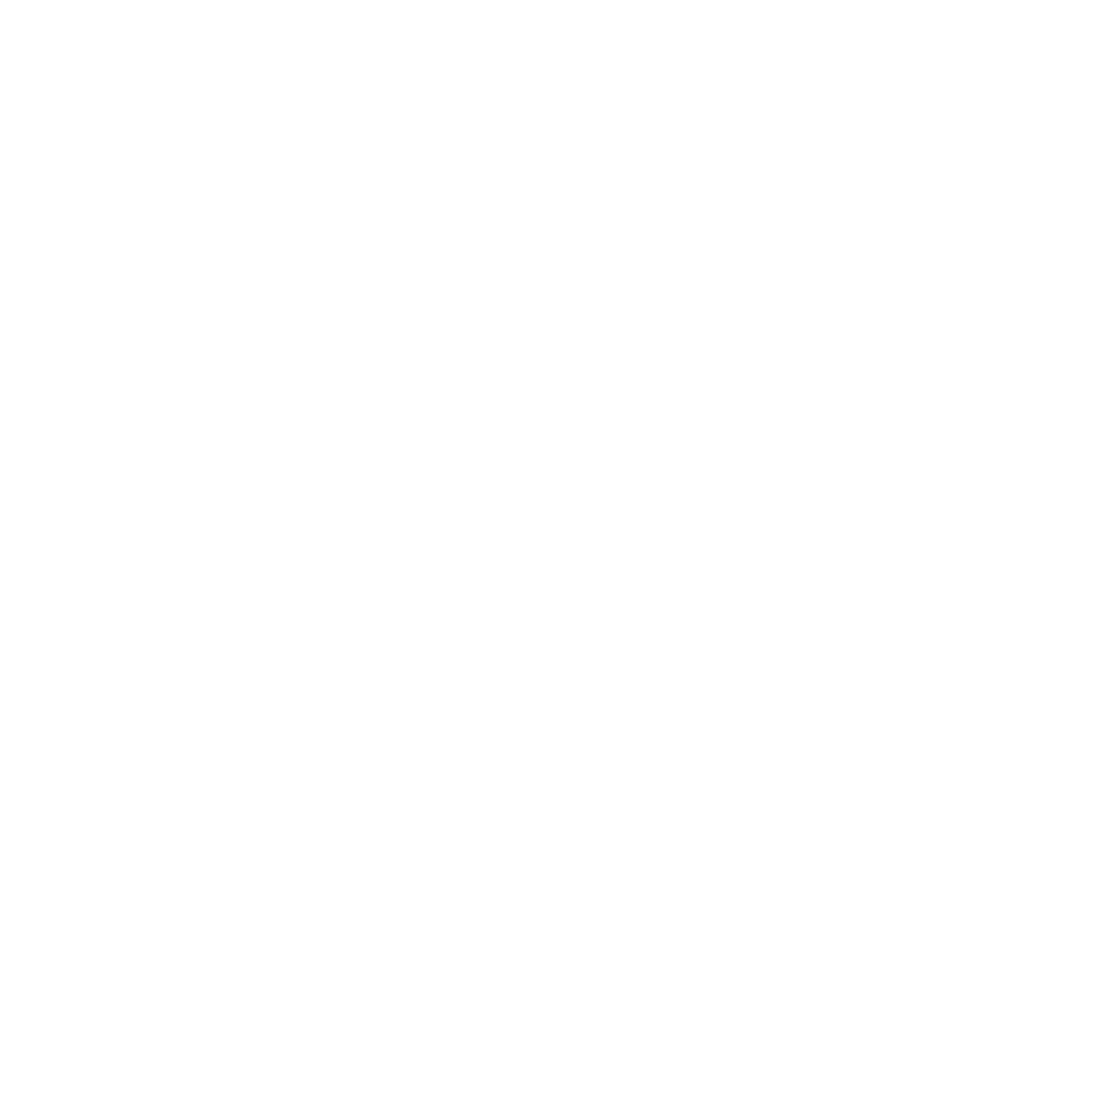 Startup52